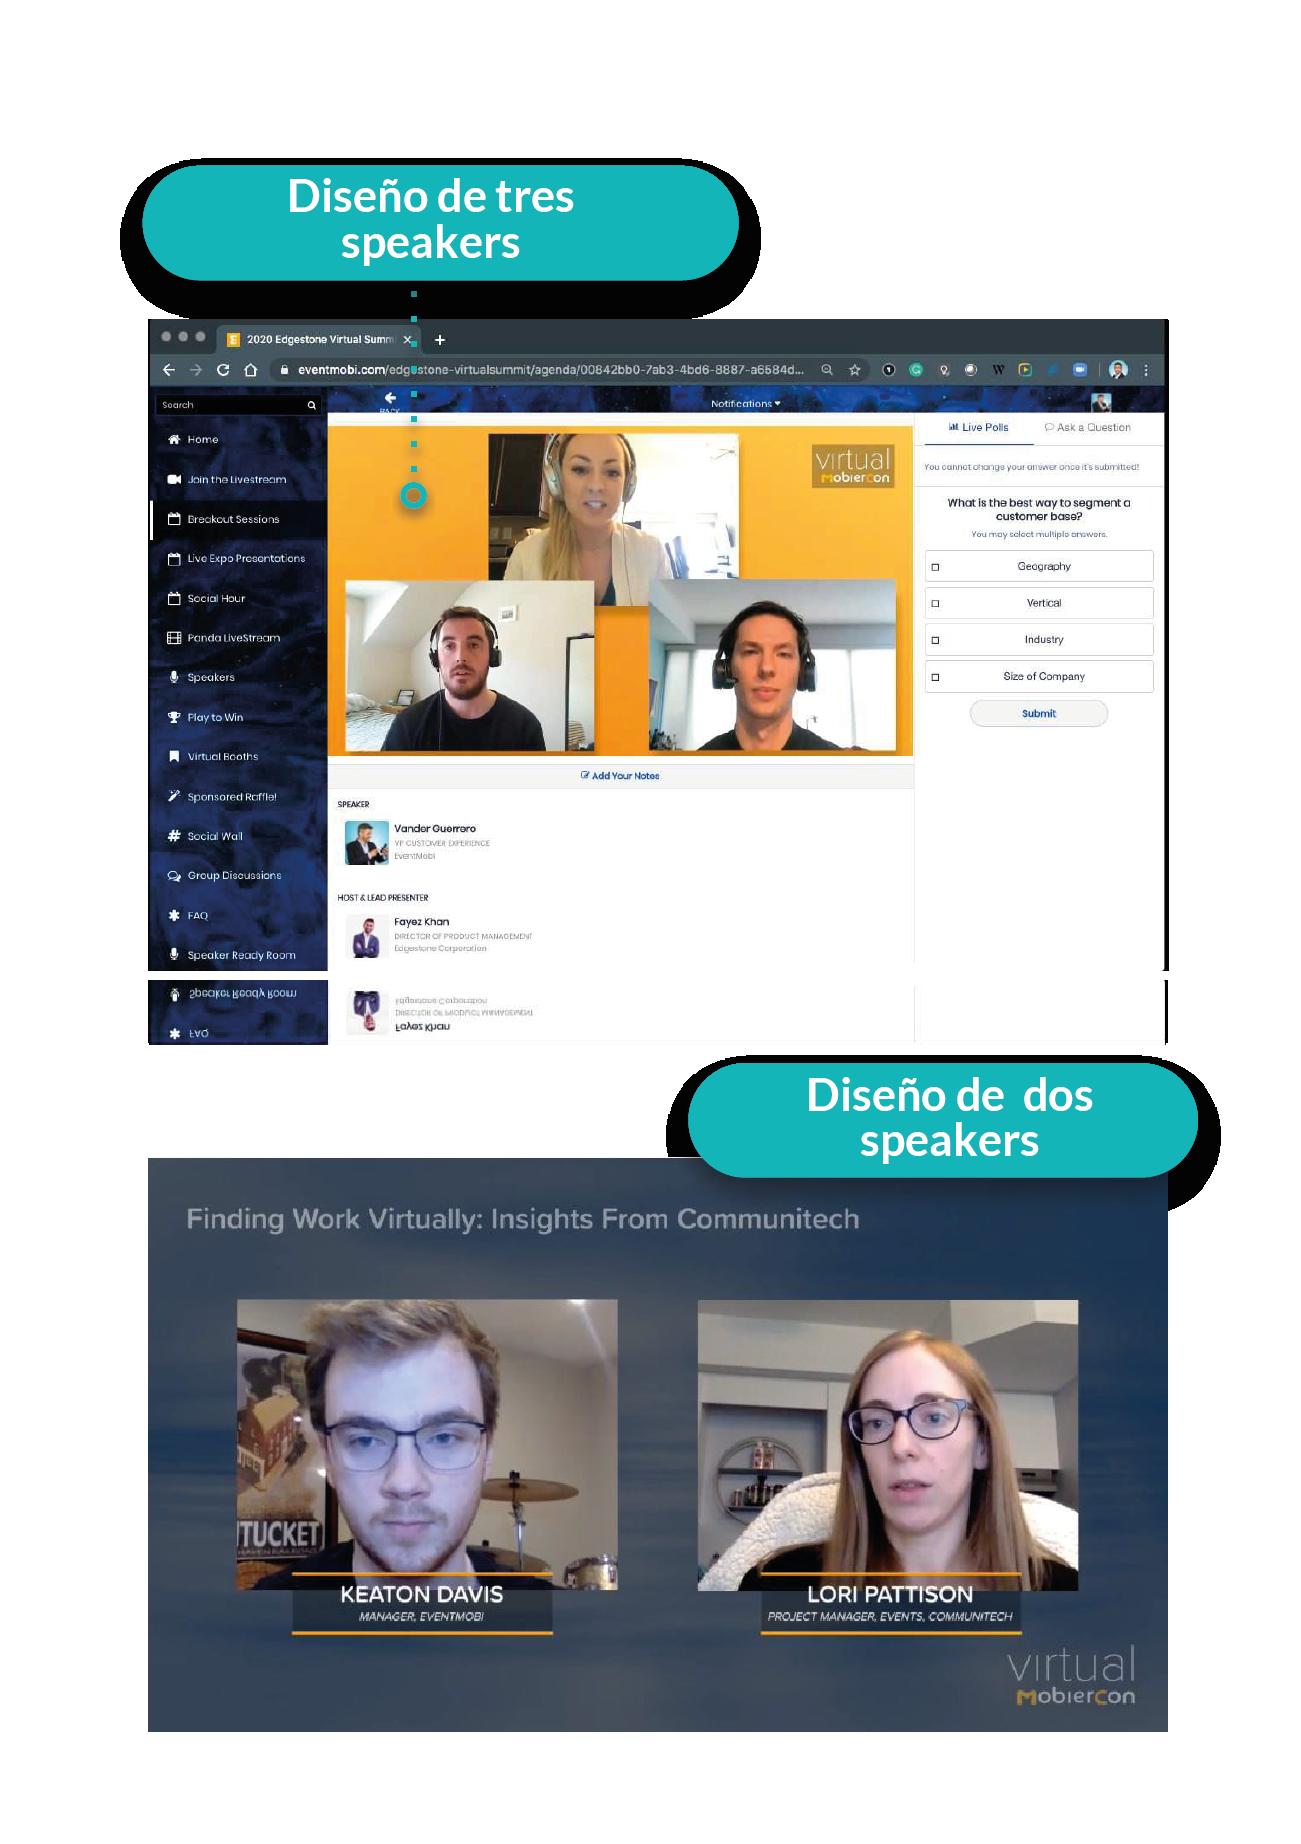 Múltiples ponentes en eventos virtuales